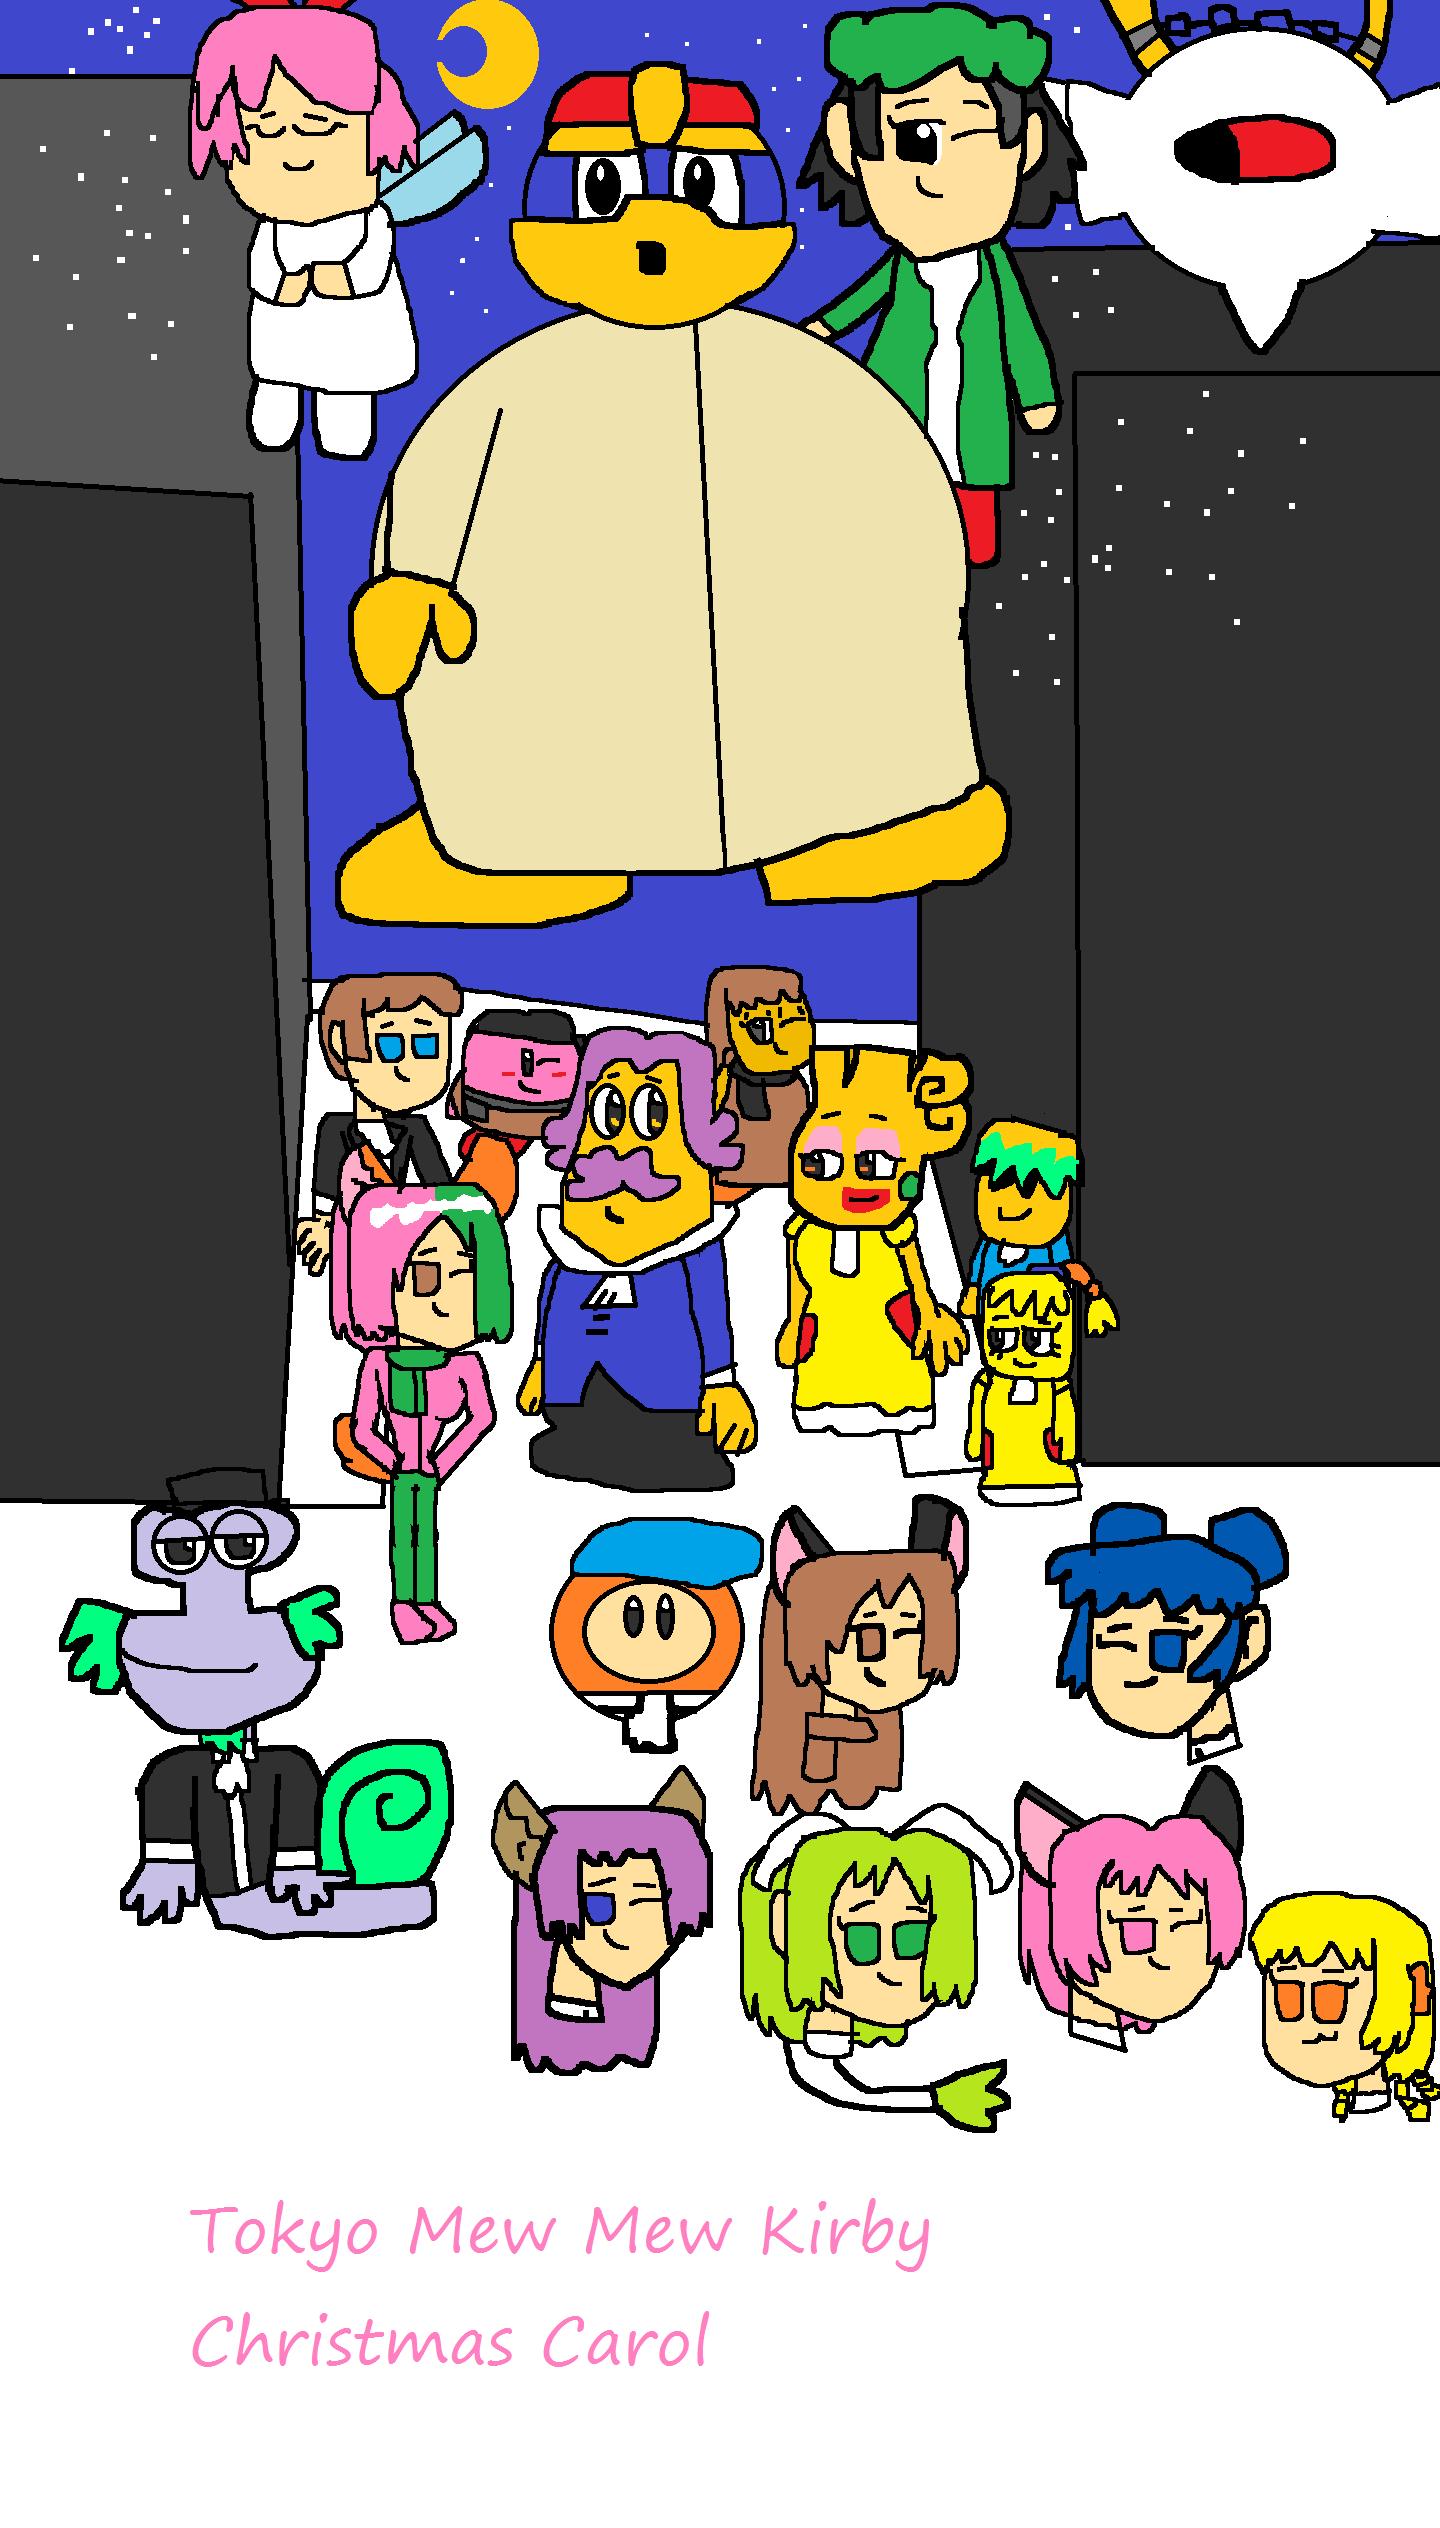 Tokyo Mew Mew Kirby Christmas Carol by kasden95 on DeviantArt